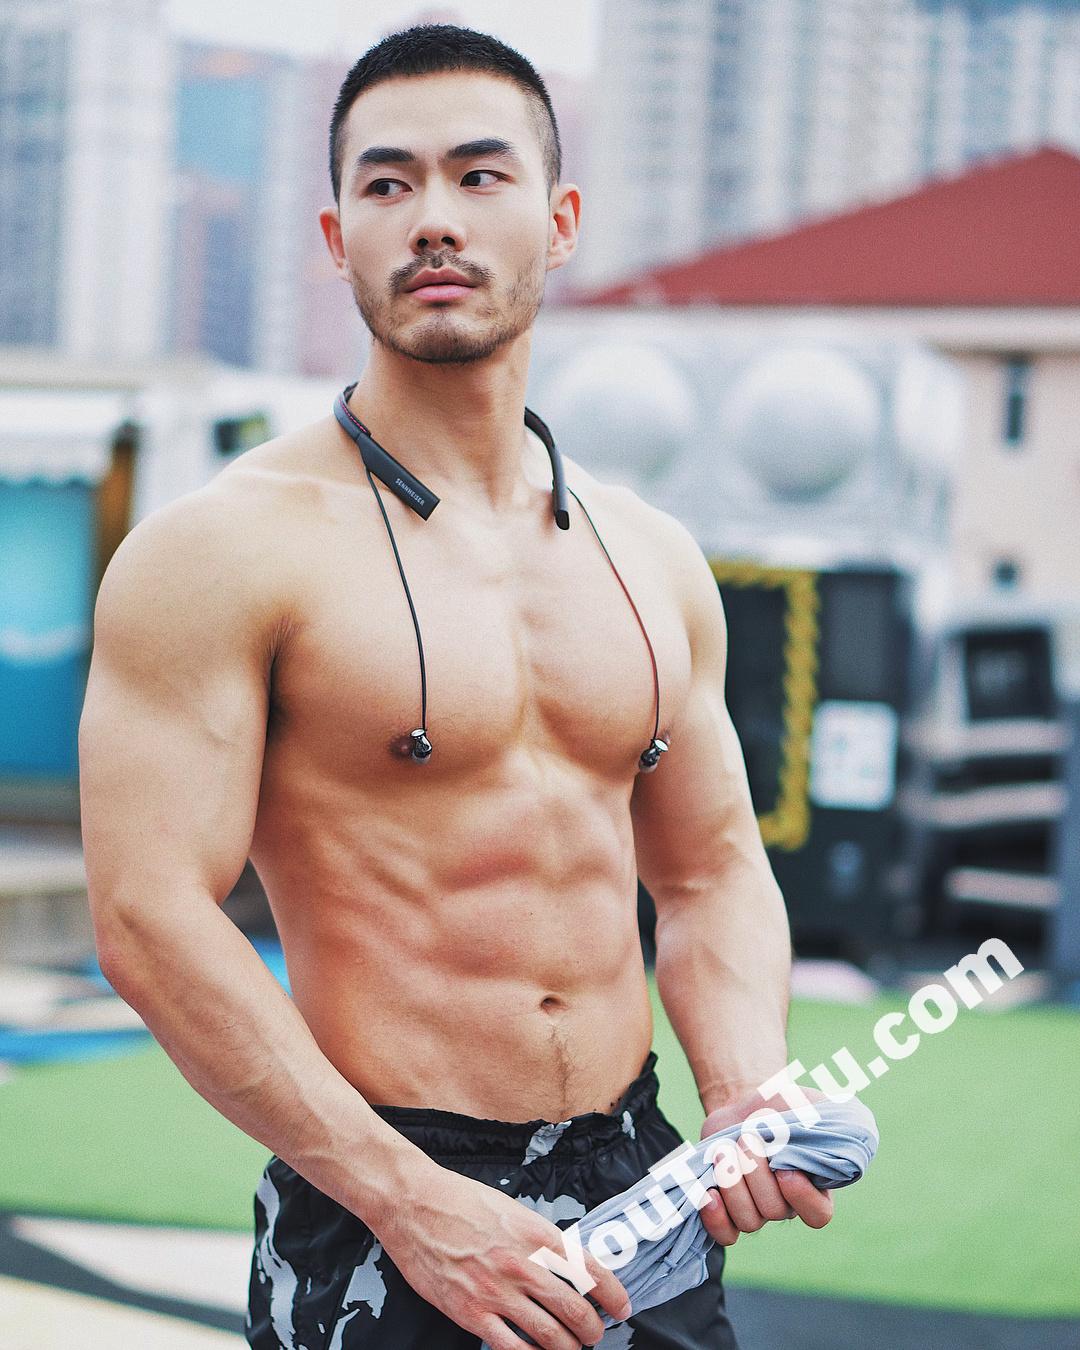 NAA05健身男神套图727张照片+104视频-3